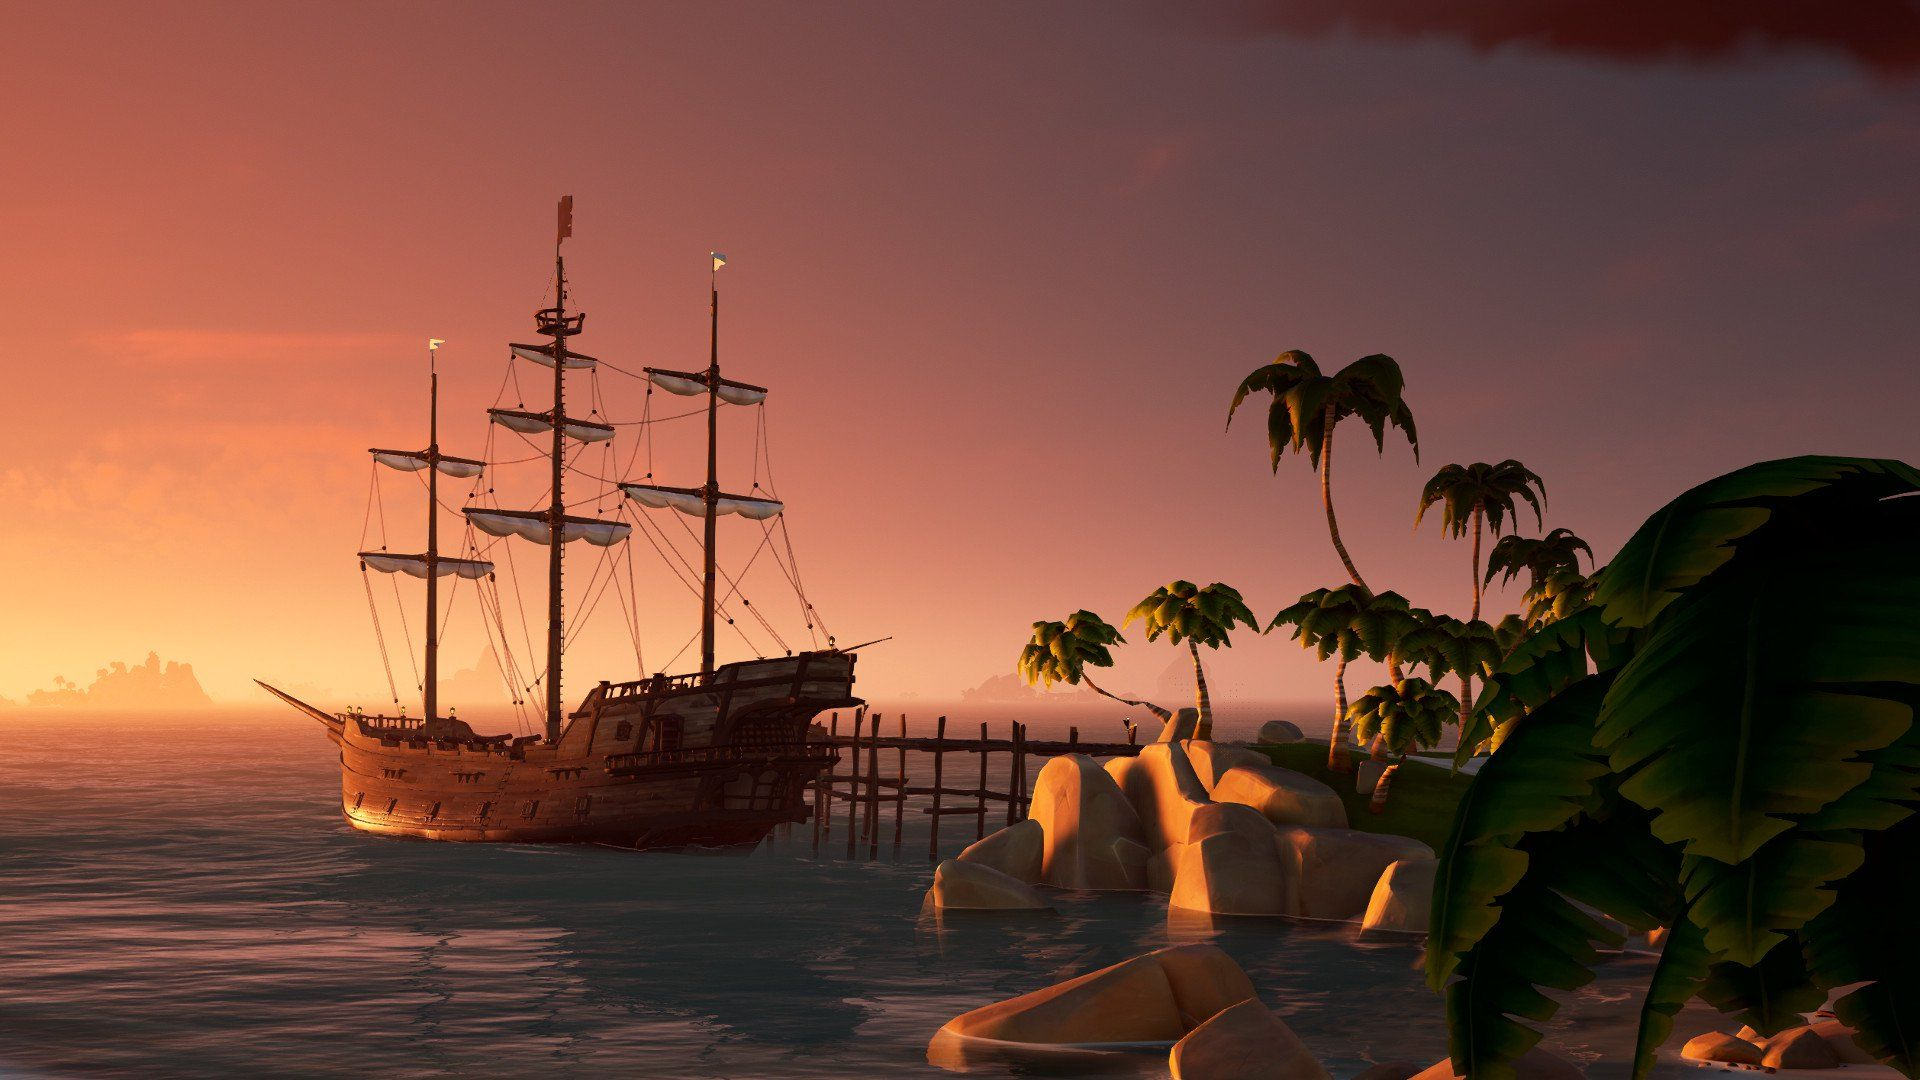 Sea Of Thieves Sails Into Closed Beta January 24 Sea of